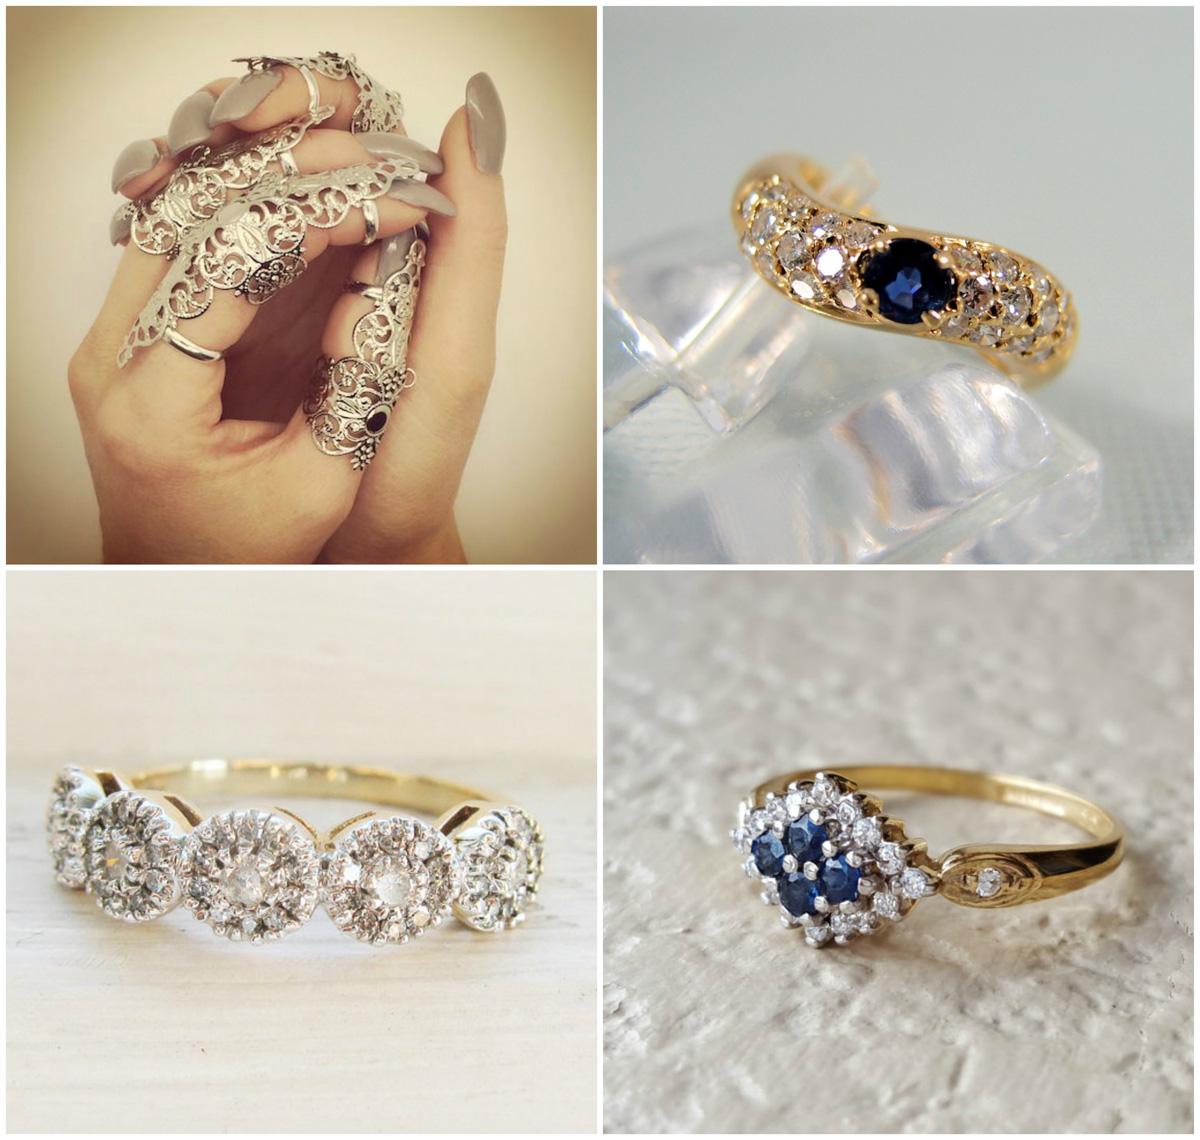 budget-vintage-wedding-rings